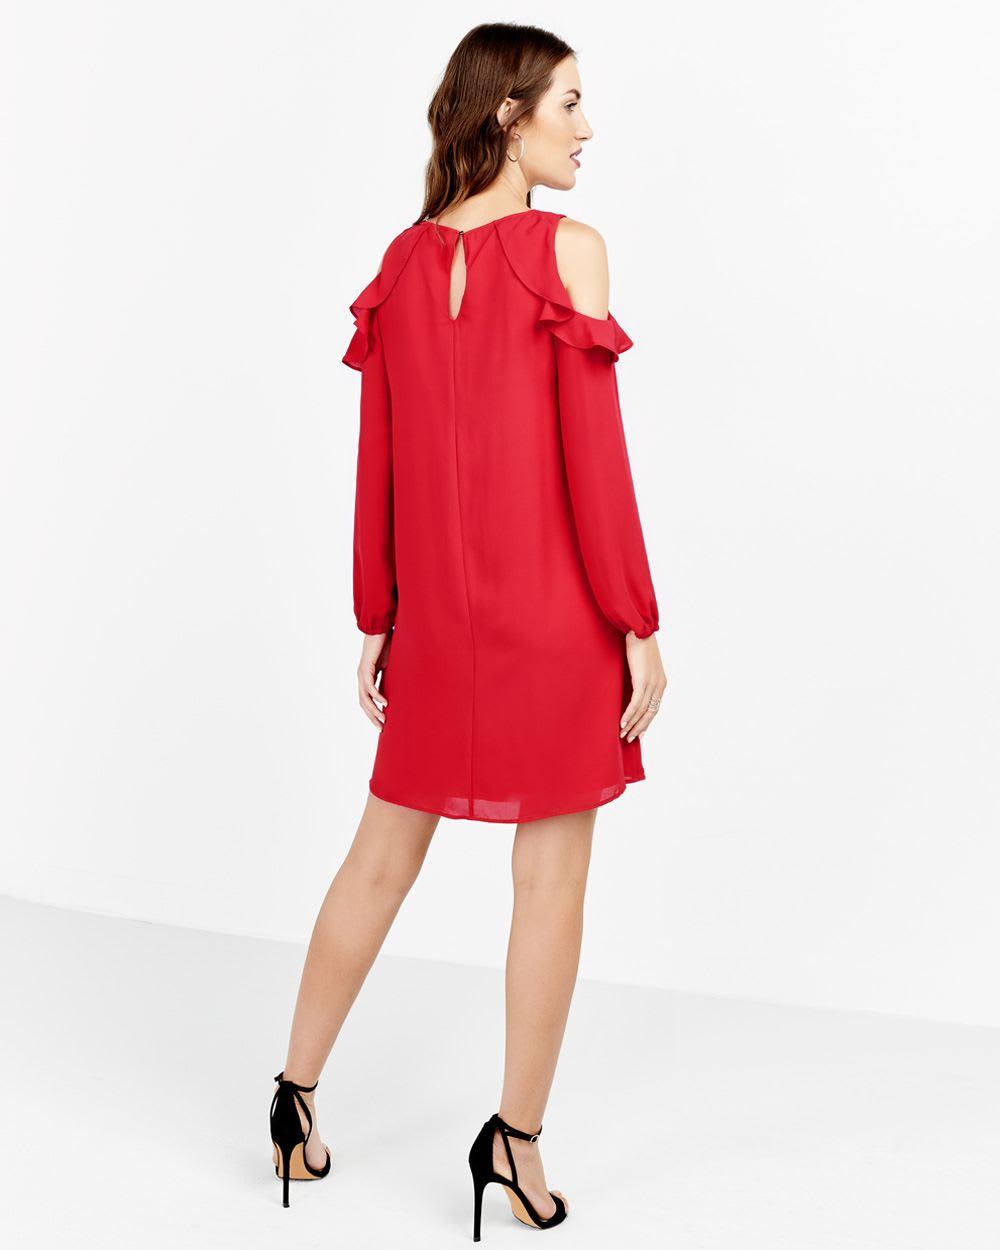 79c61dee992ea Ruffle Cold Shoulder Dress